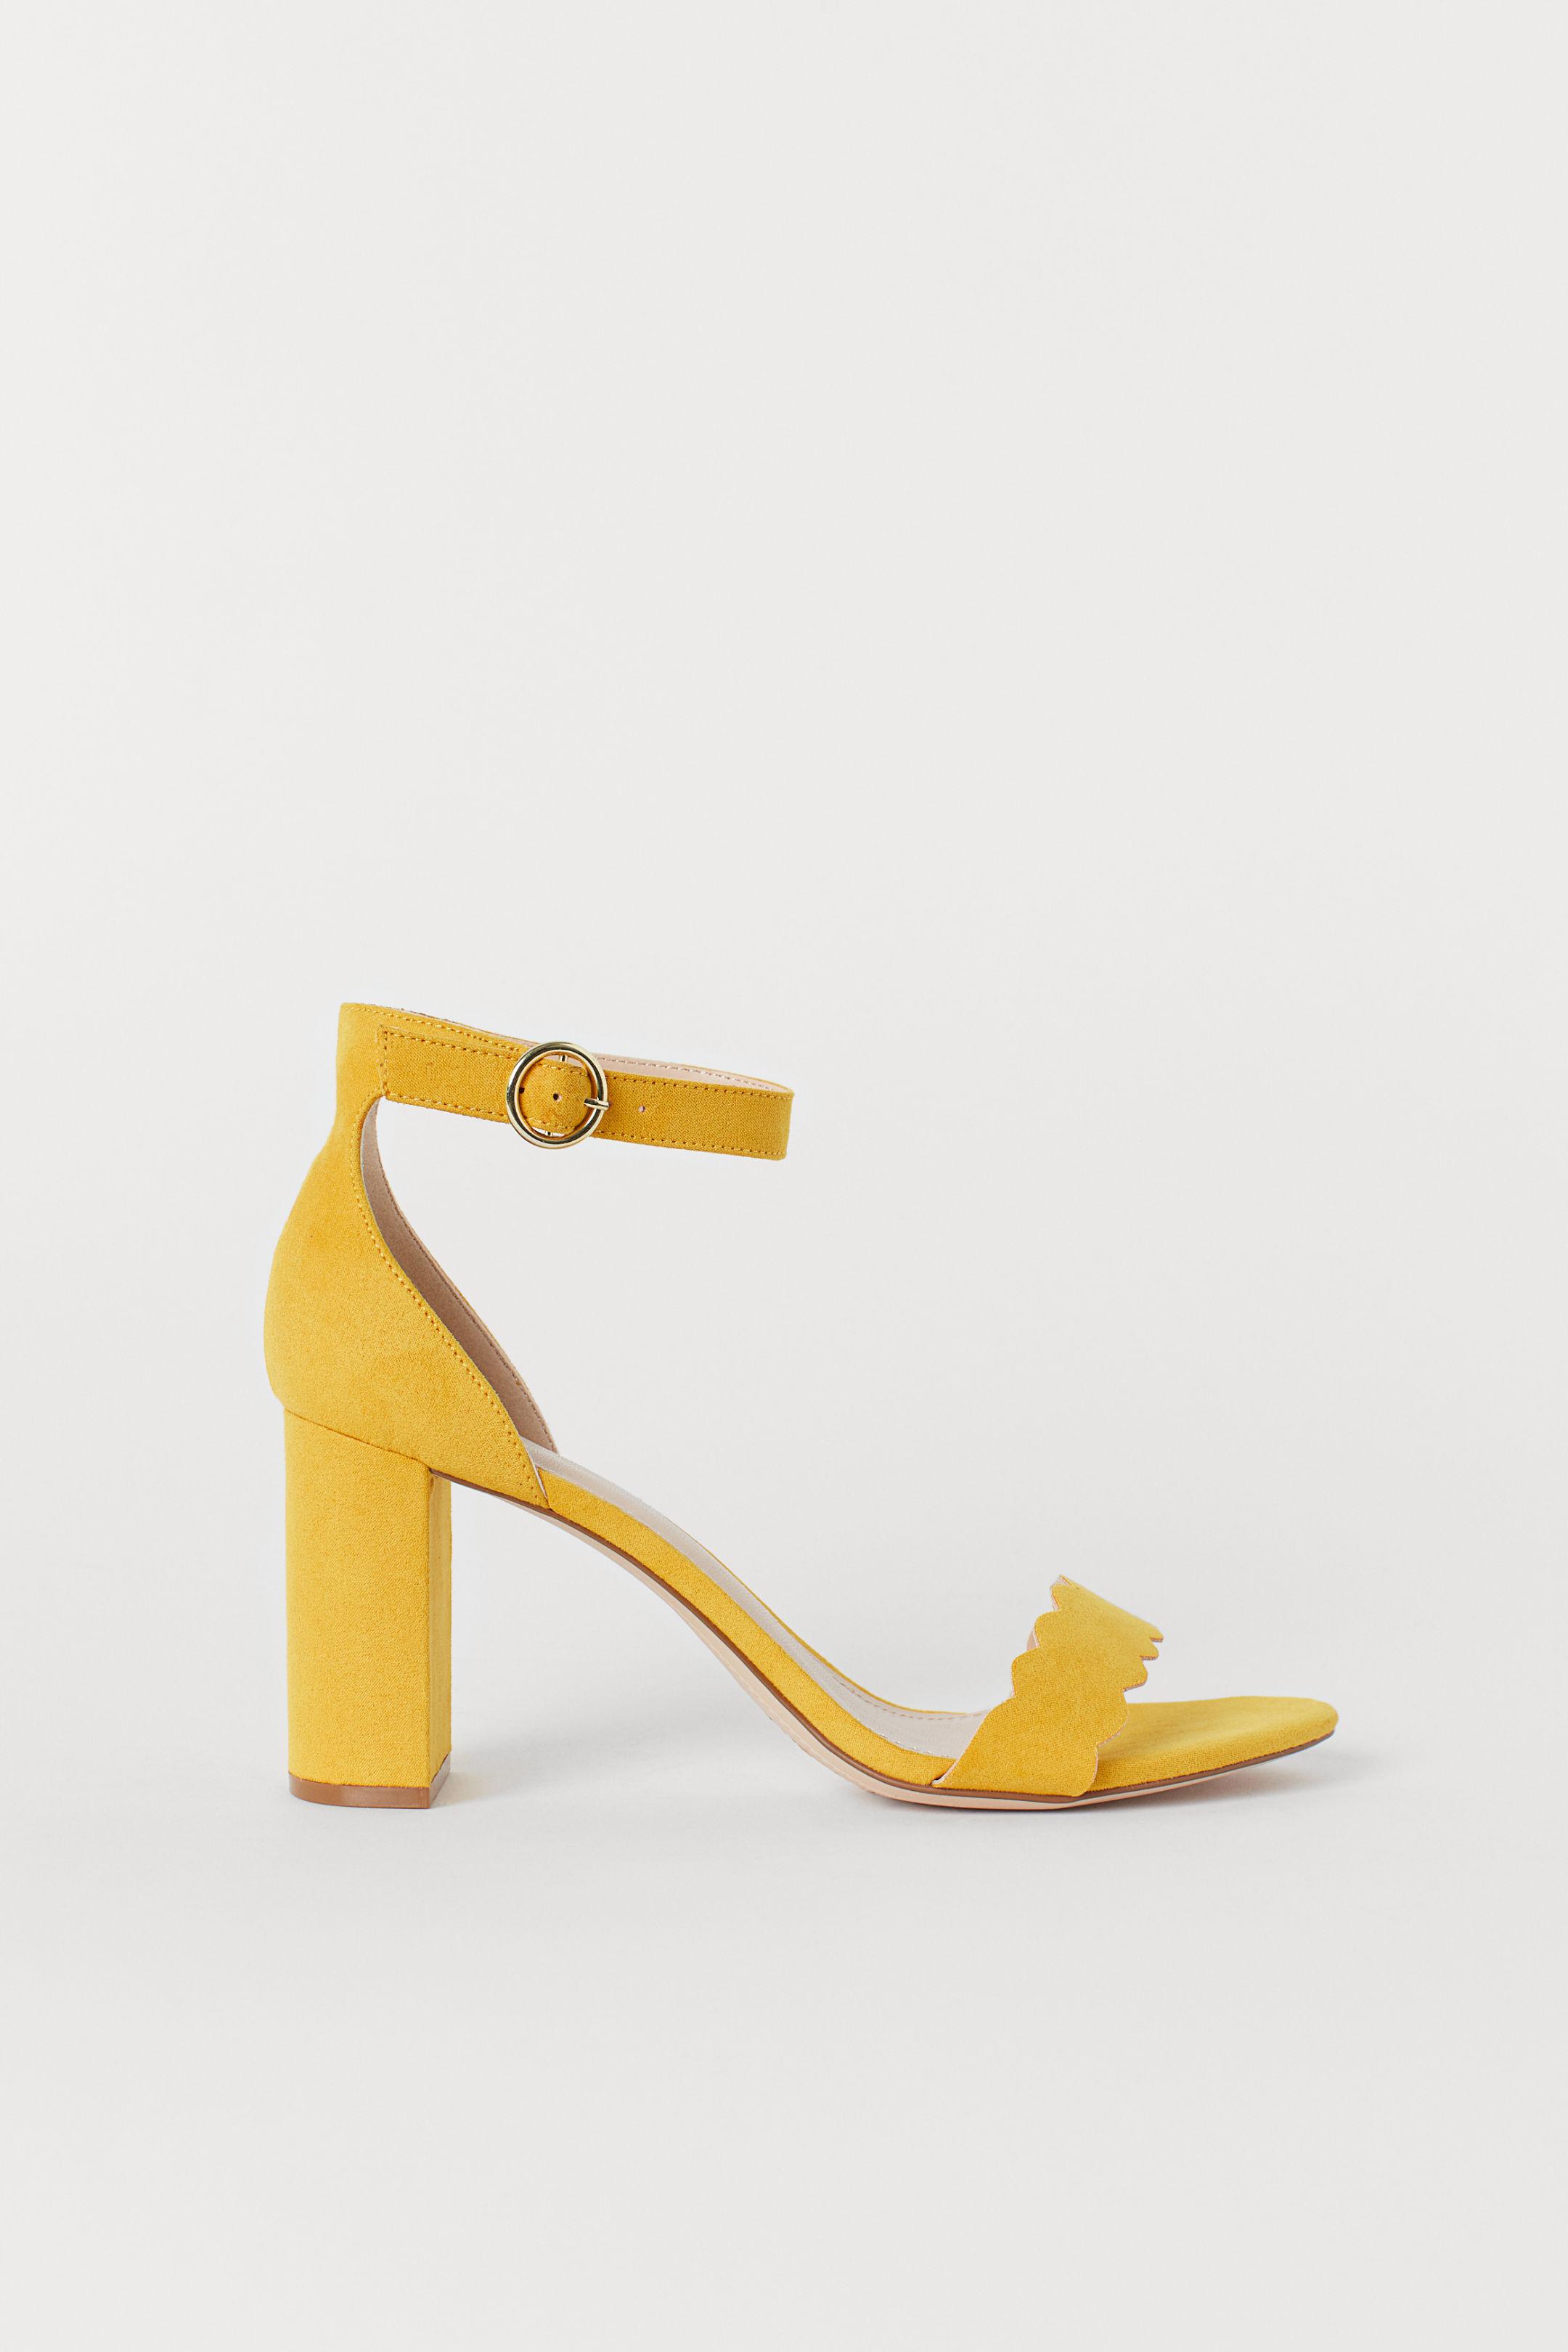 High heels shoes - Imitation Suede Sandals